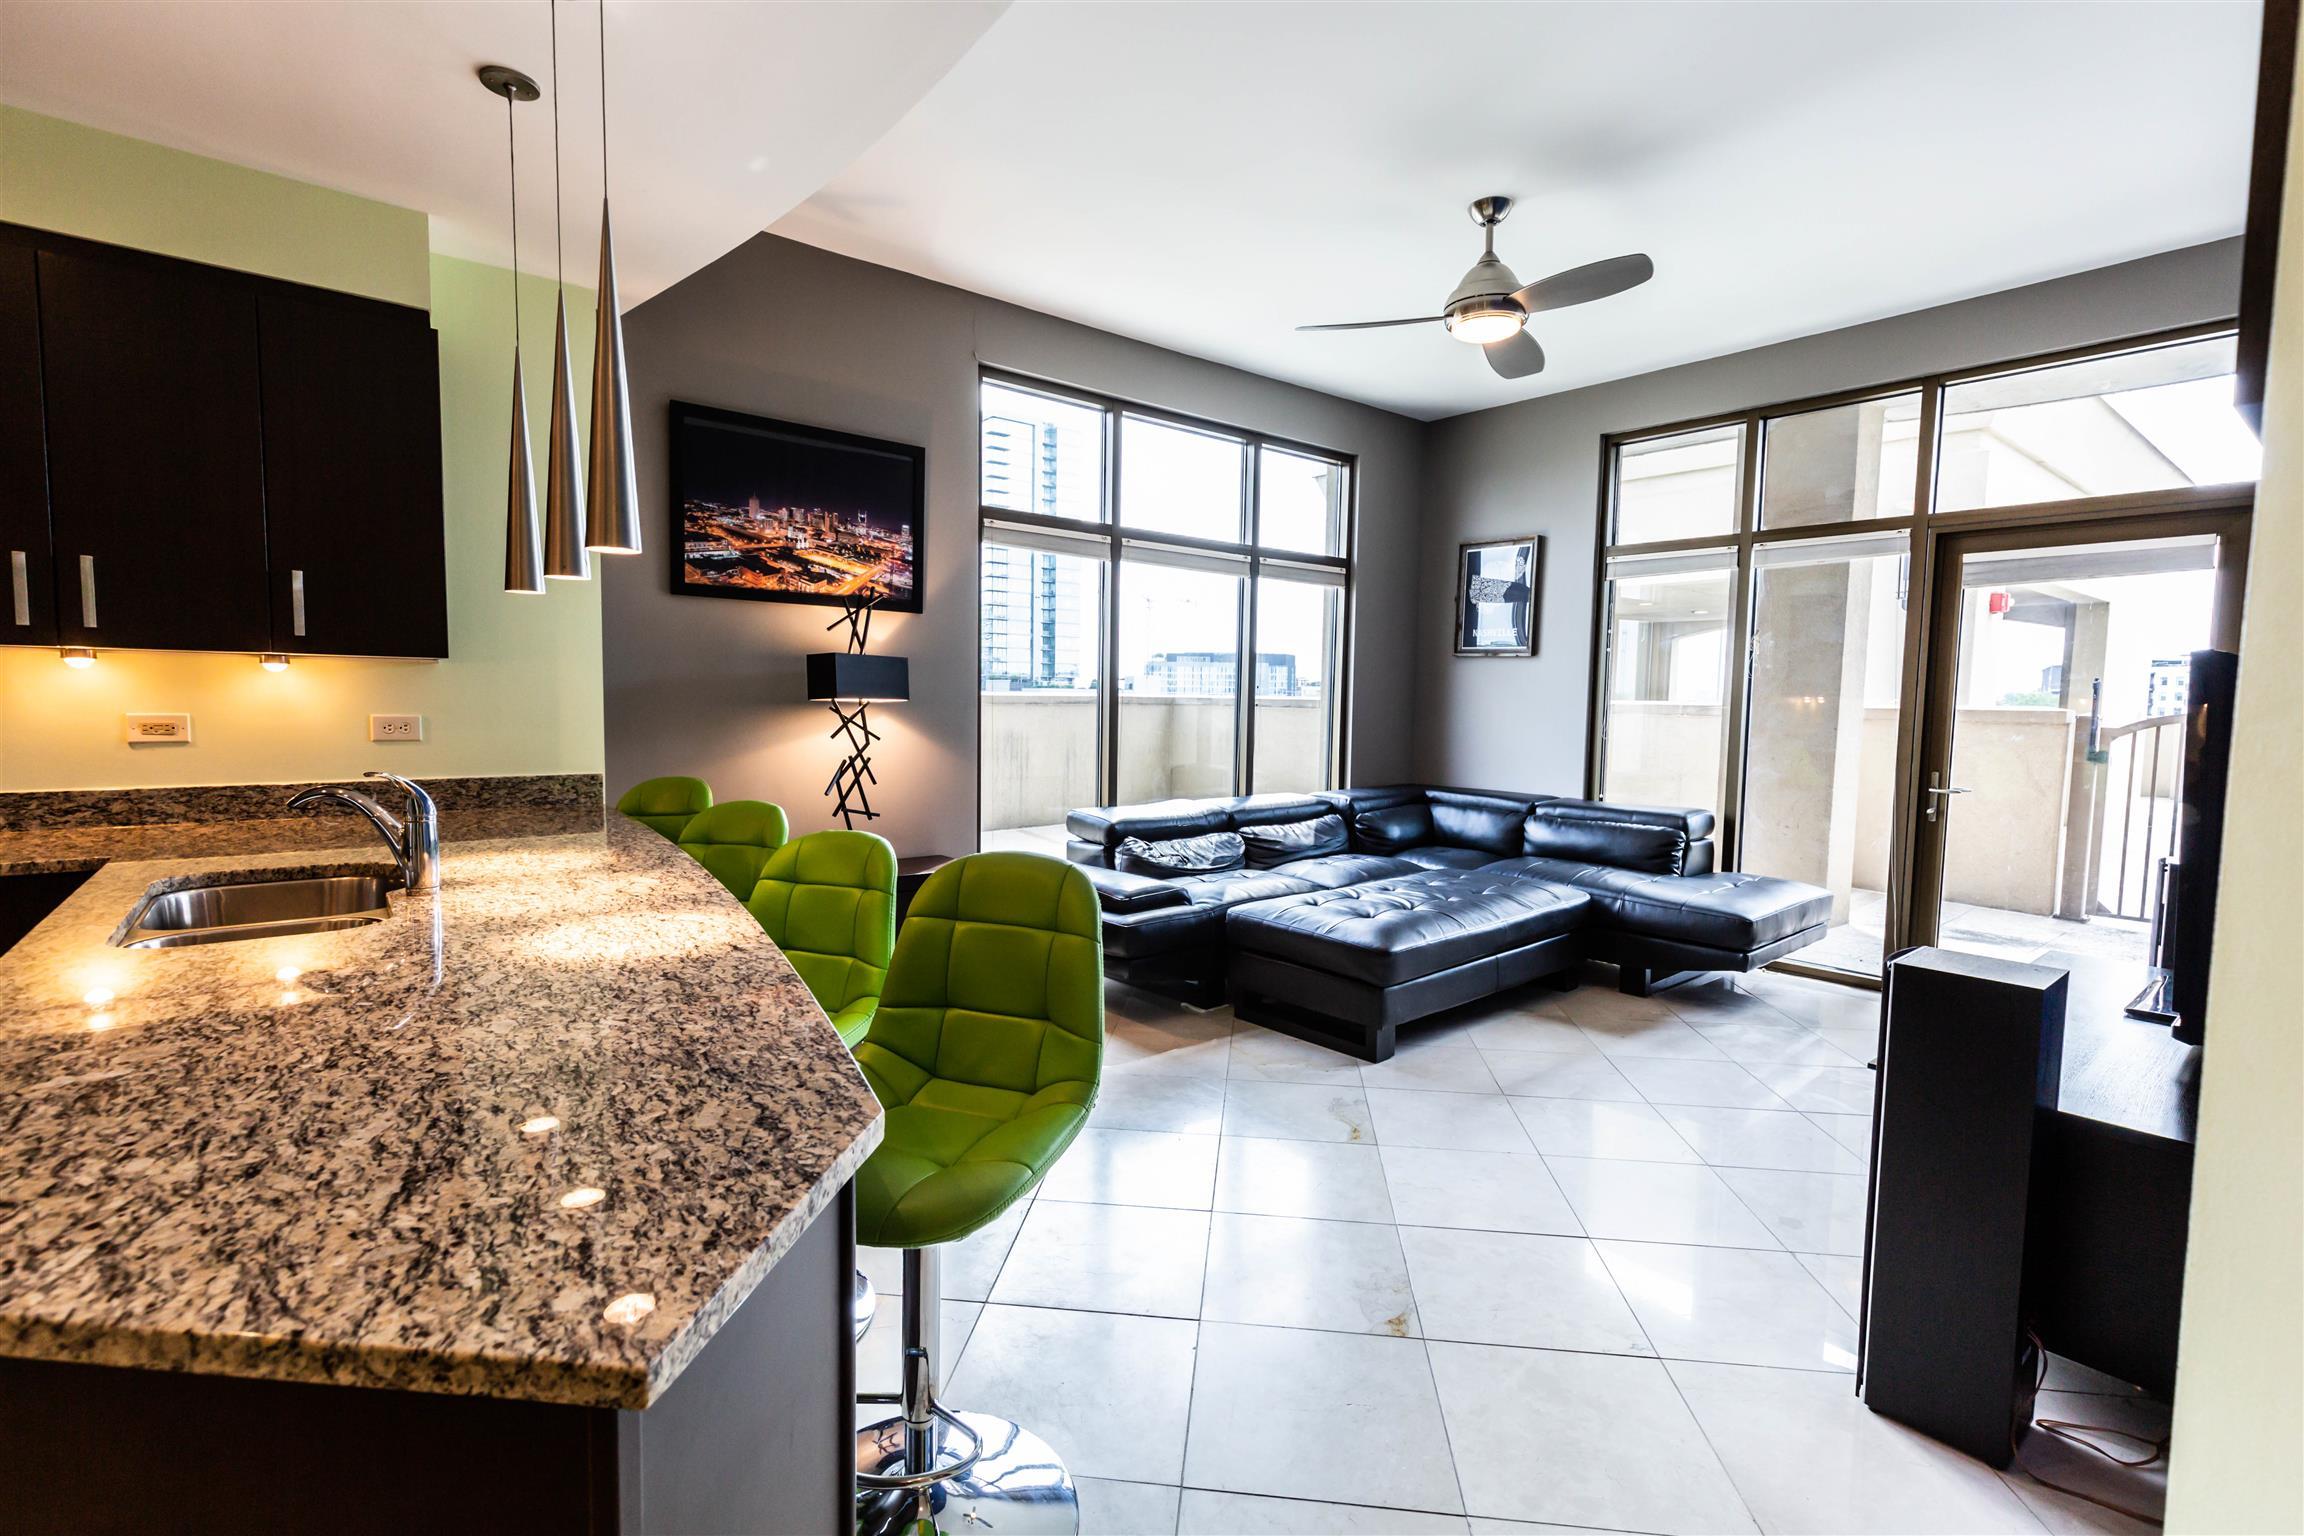 1510 Demonbreun St #502, Nashville, TN 37203 - Nashville, TN real estate listing